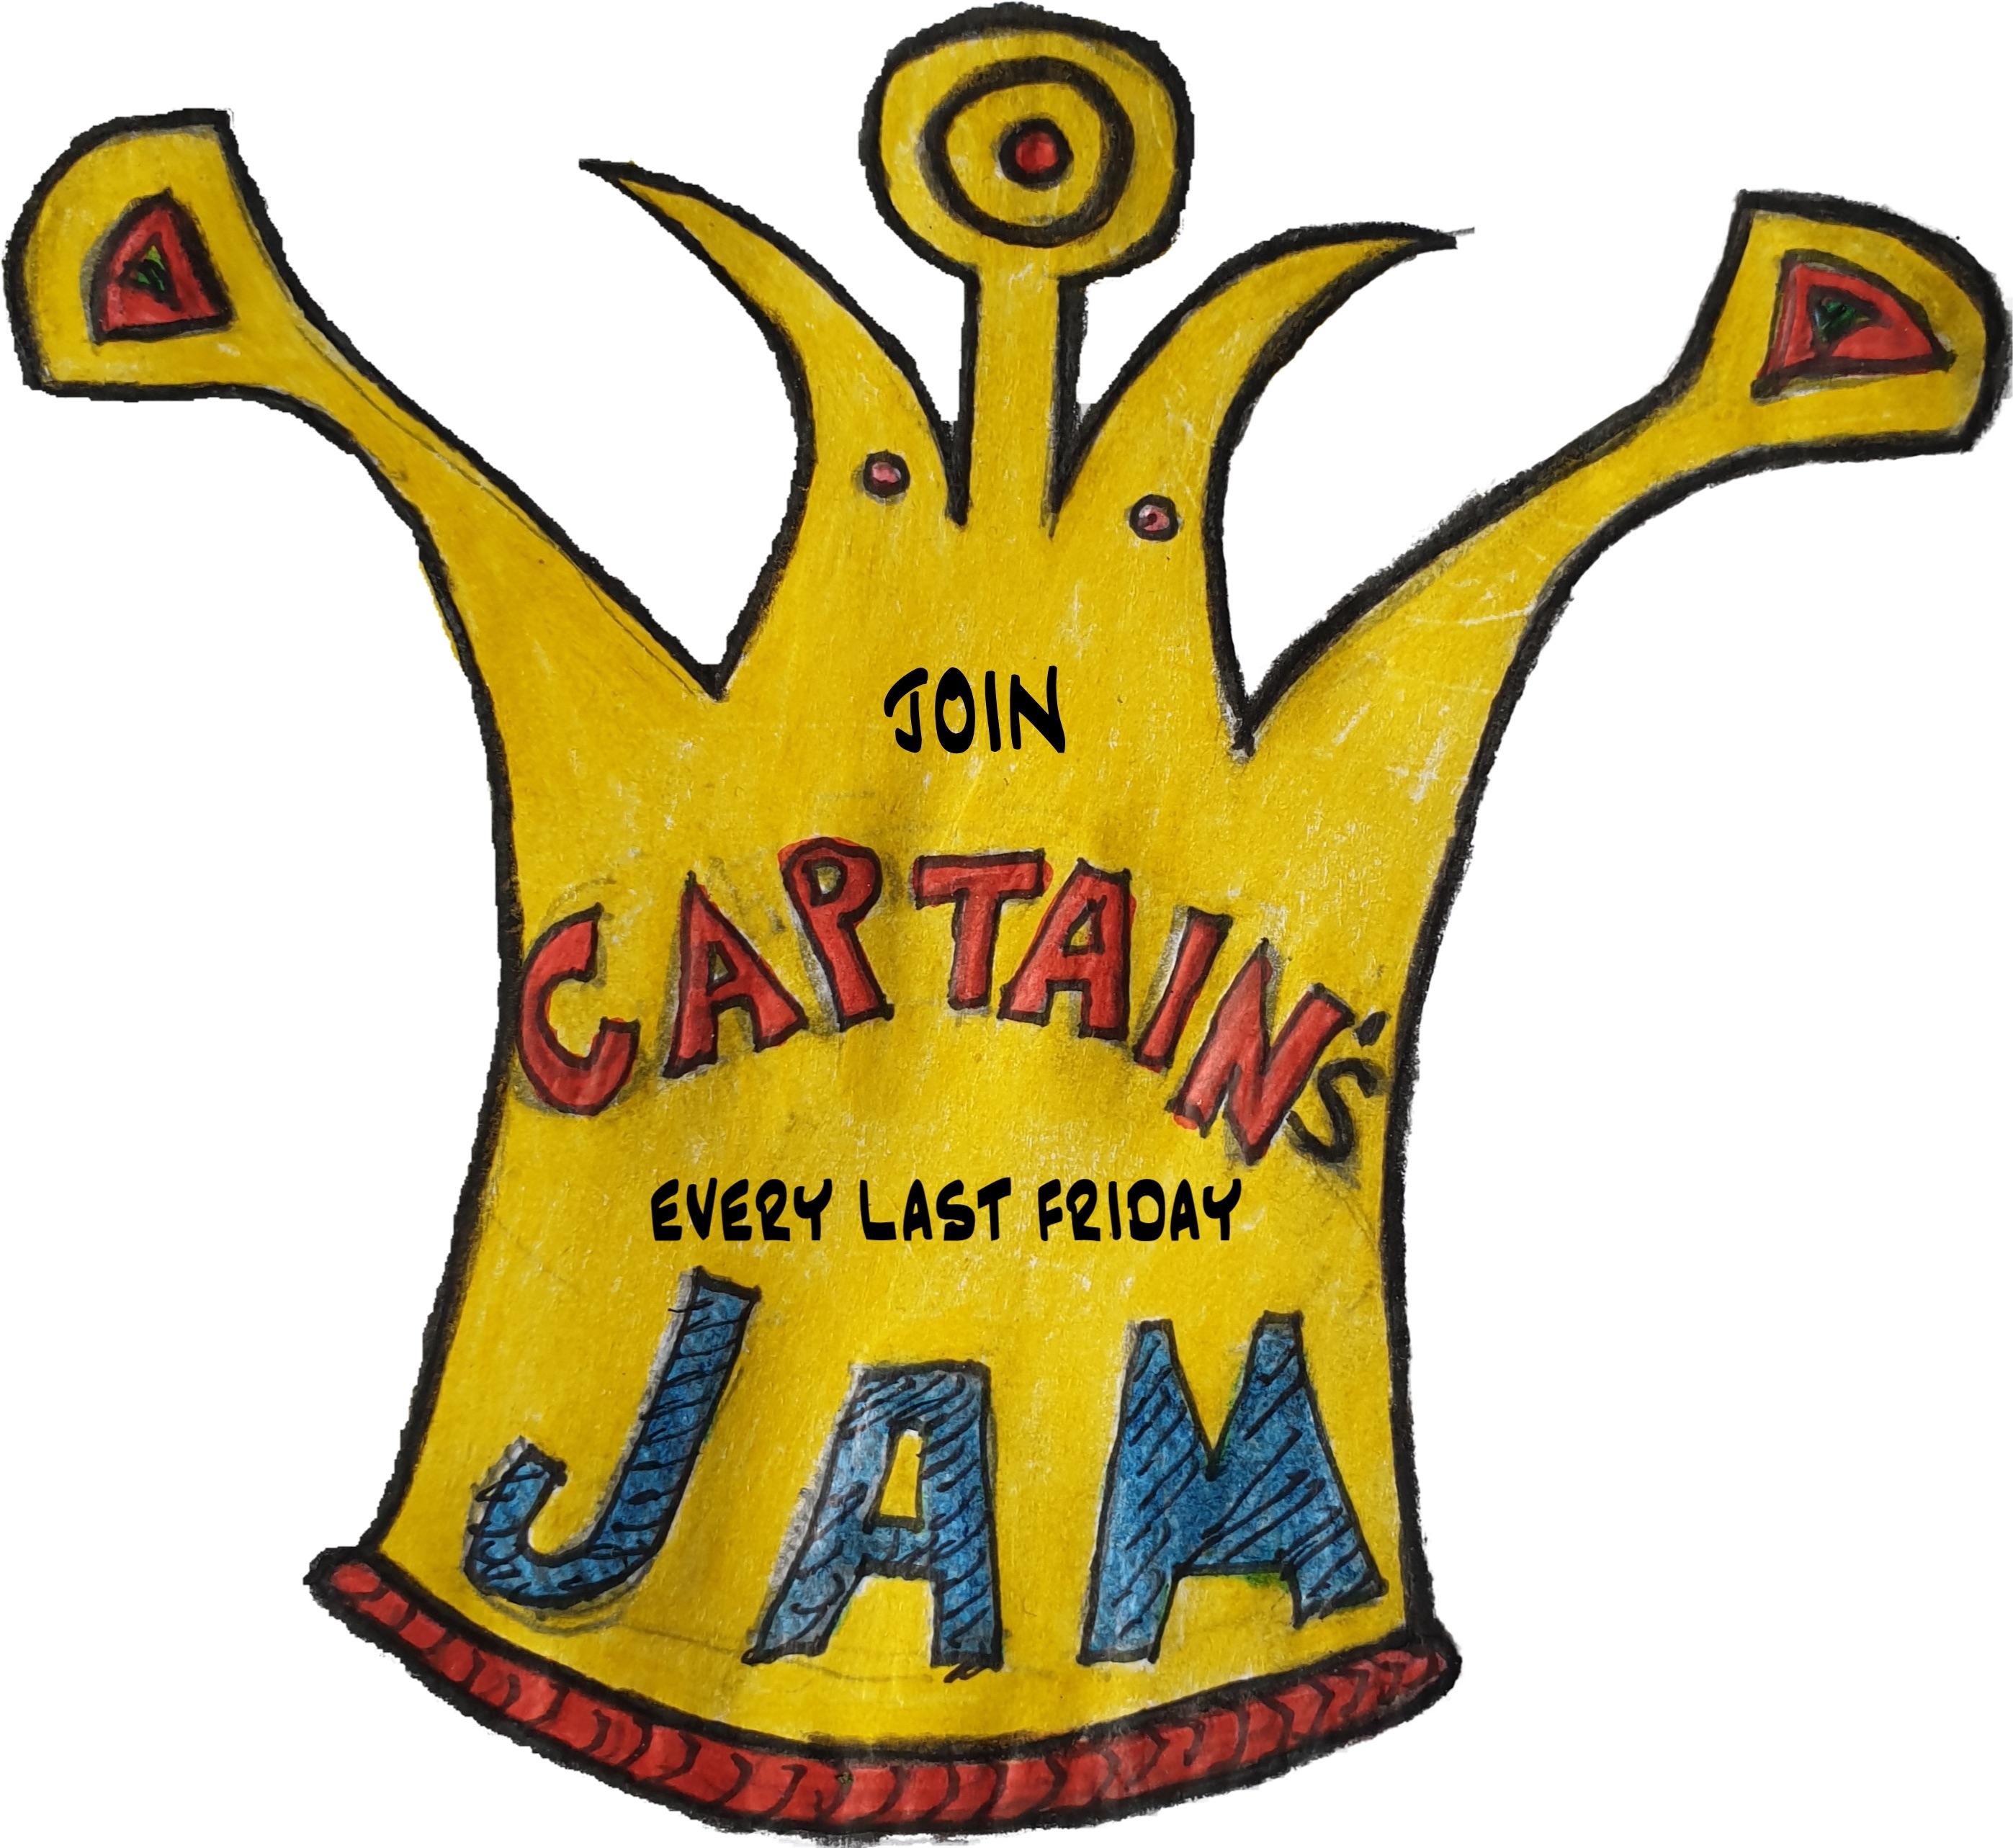 Captain's Jam